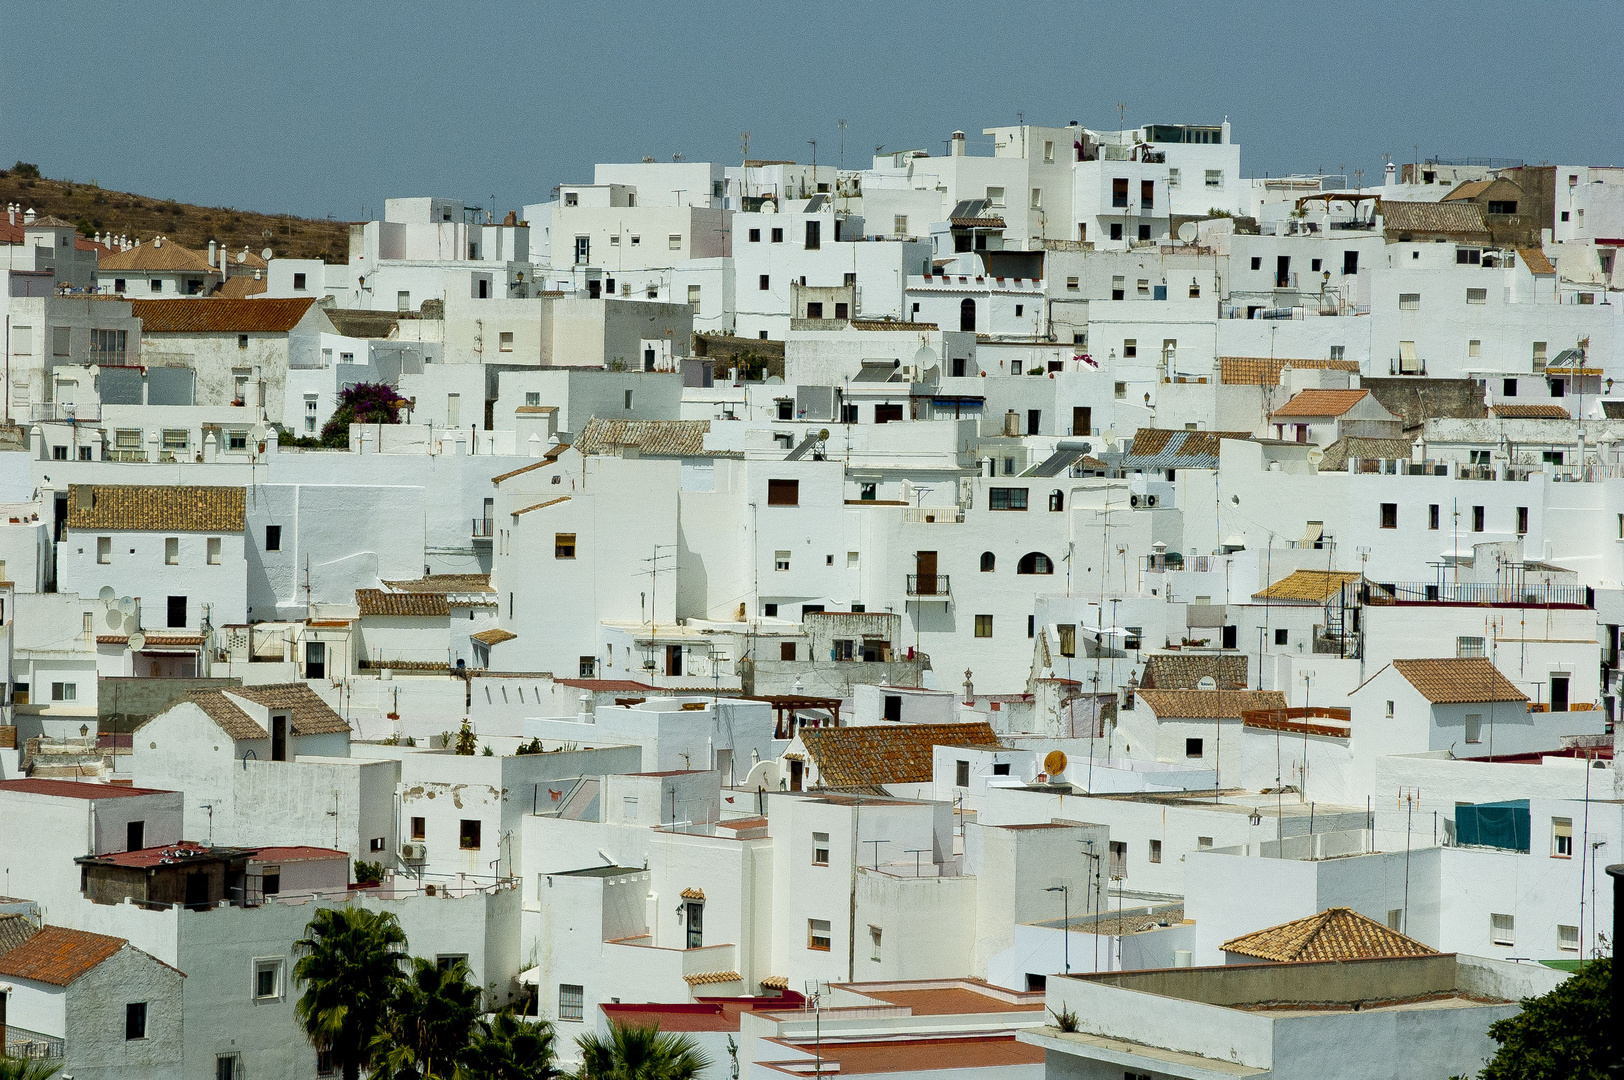 Vejer de la Frontera, Cadiz.